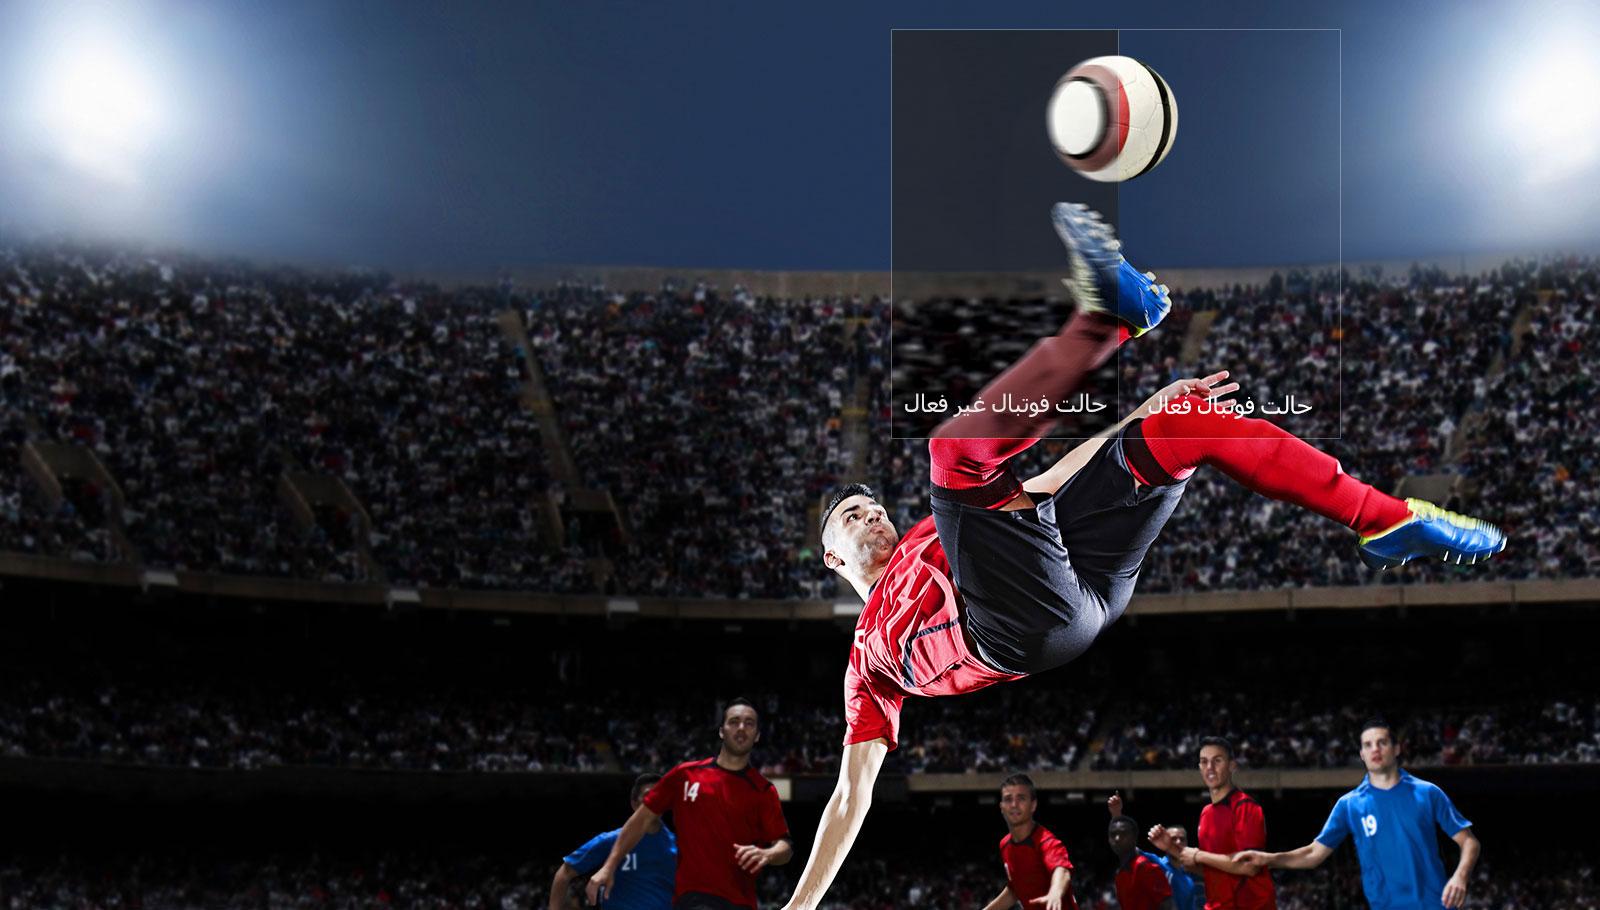 03_SK79_B_Football_Mode_desktop_V2